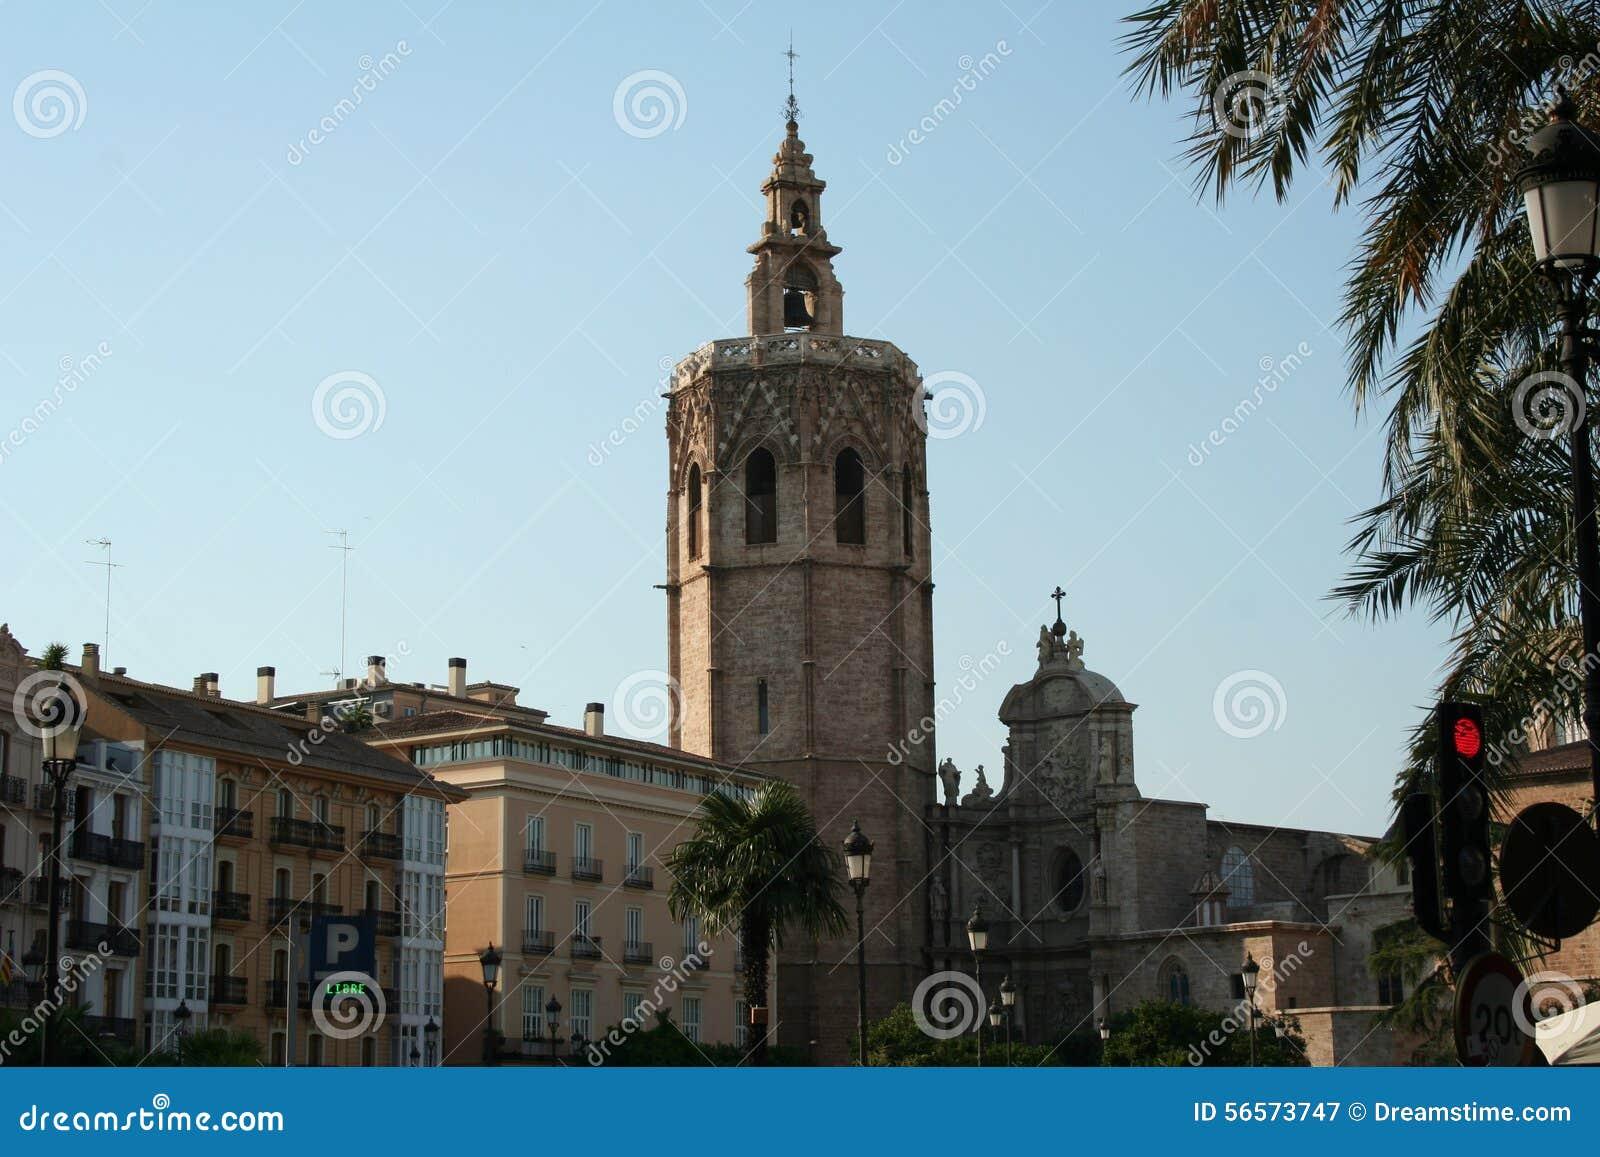 Download Valensia στοκ εικόνα. εικόνα από εκκλησία, ευρώπη, ιστορία - 56573747